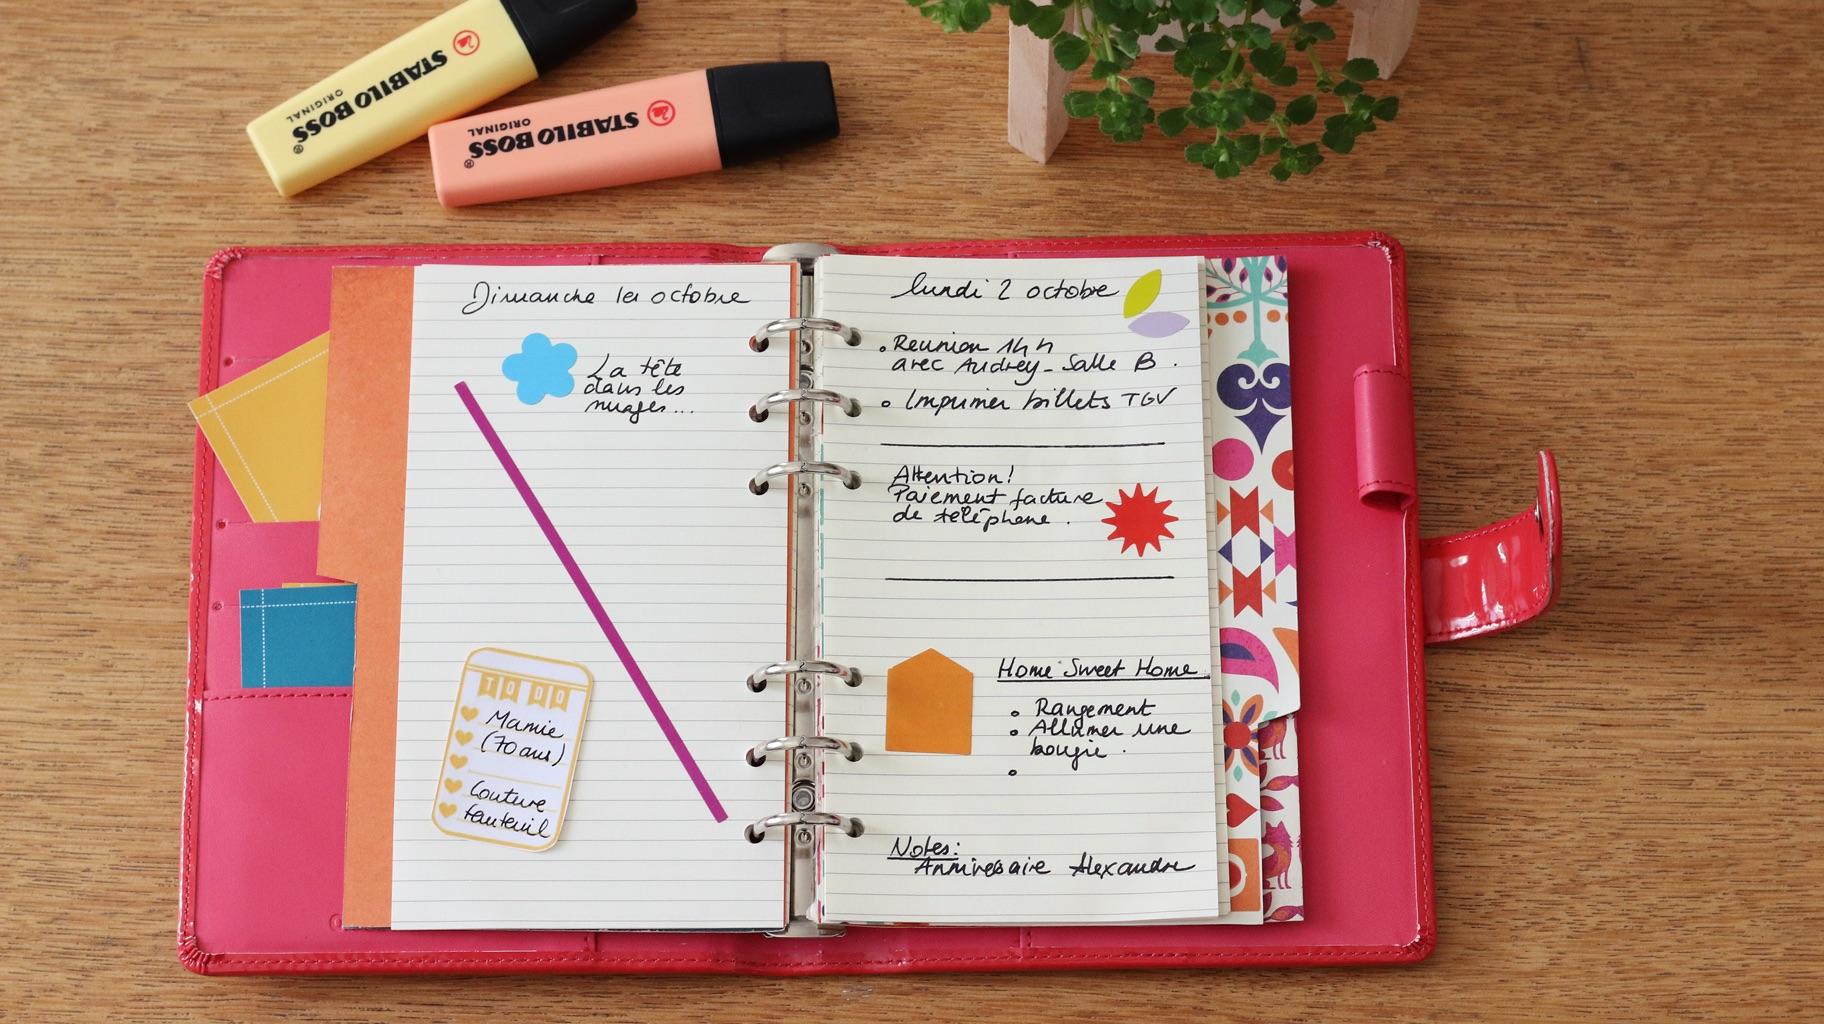 trucs-astuces-organisation-quotidien-printables-stickers-lifestyle-bullet-journal-organiseur